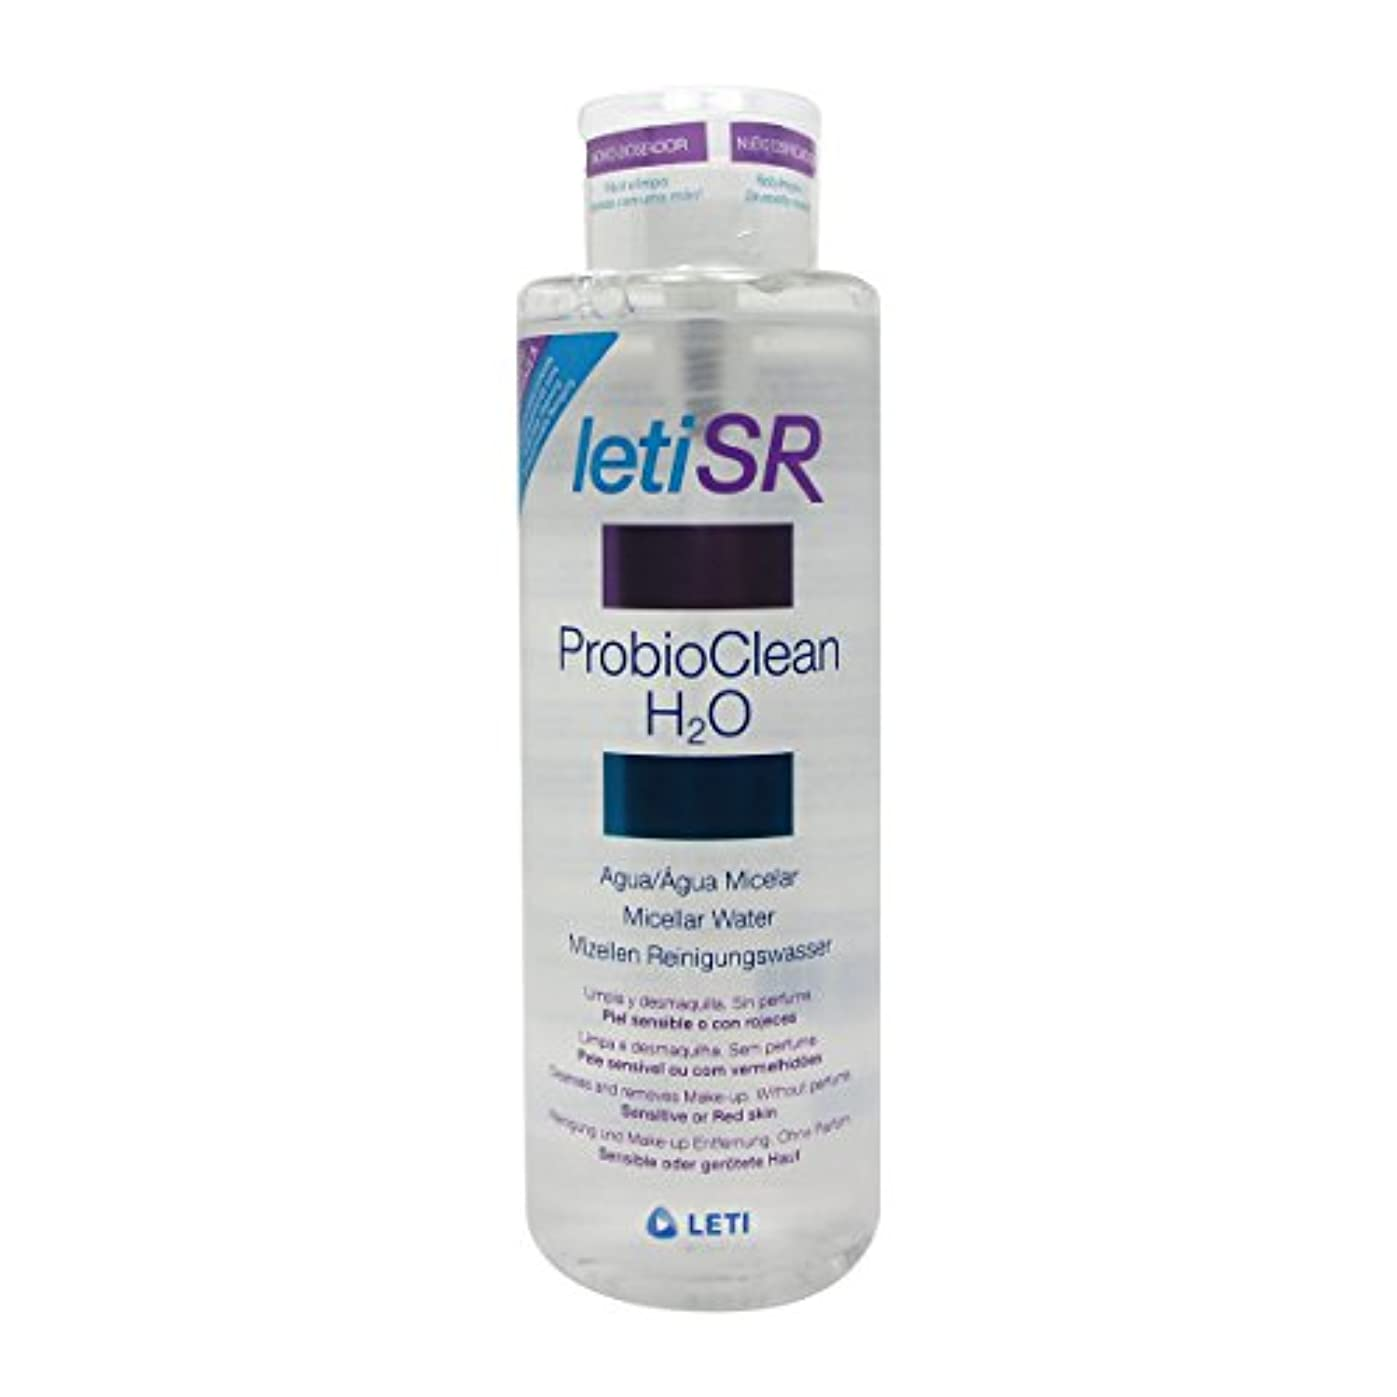 Leti Sr Probioclean H2o Micellar Water 500ml [並行輸入品]